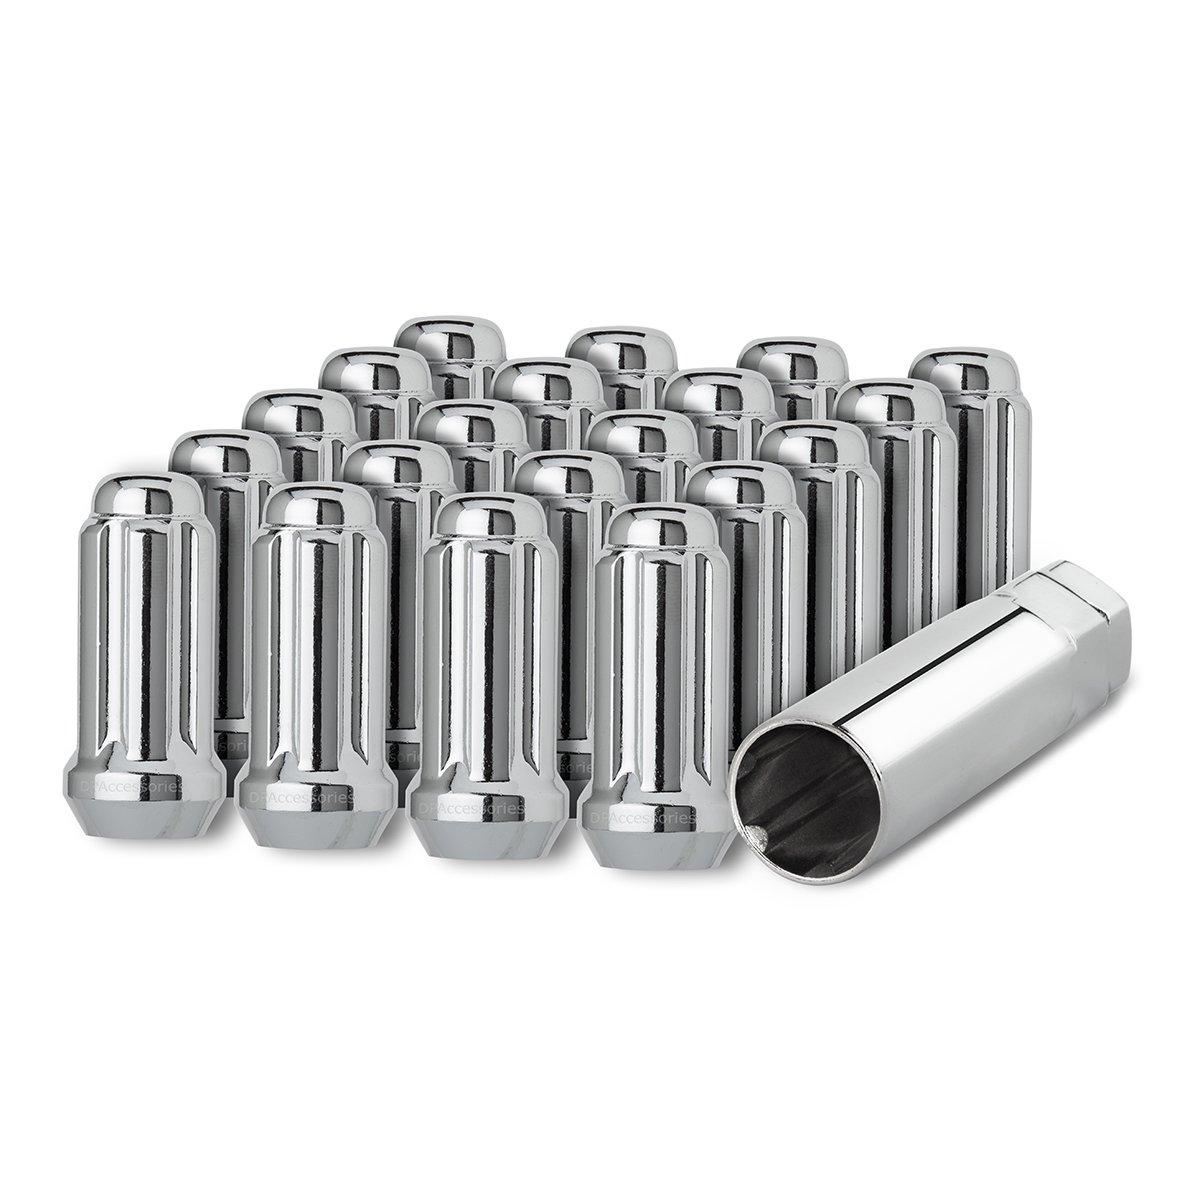 DPAccessories D5118-2305/20 20 Chrome 14x1.5 Closed End Duplex XL Spline Lug Nuts for Aftermarket Wheels Wheel Lug Nut